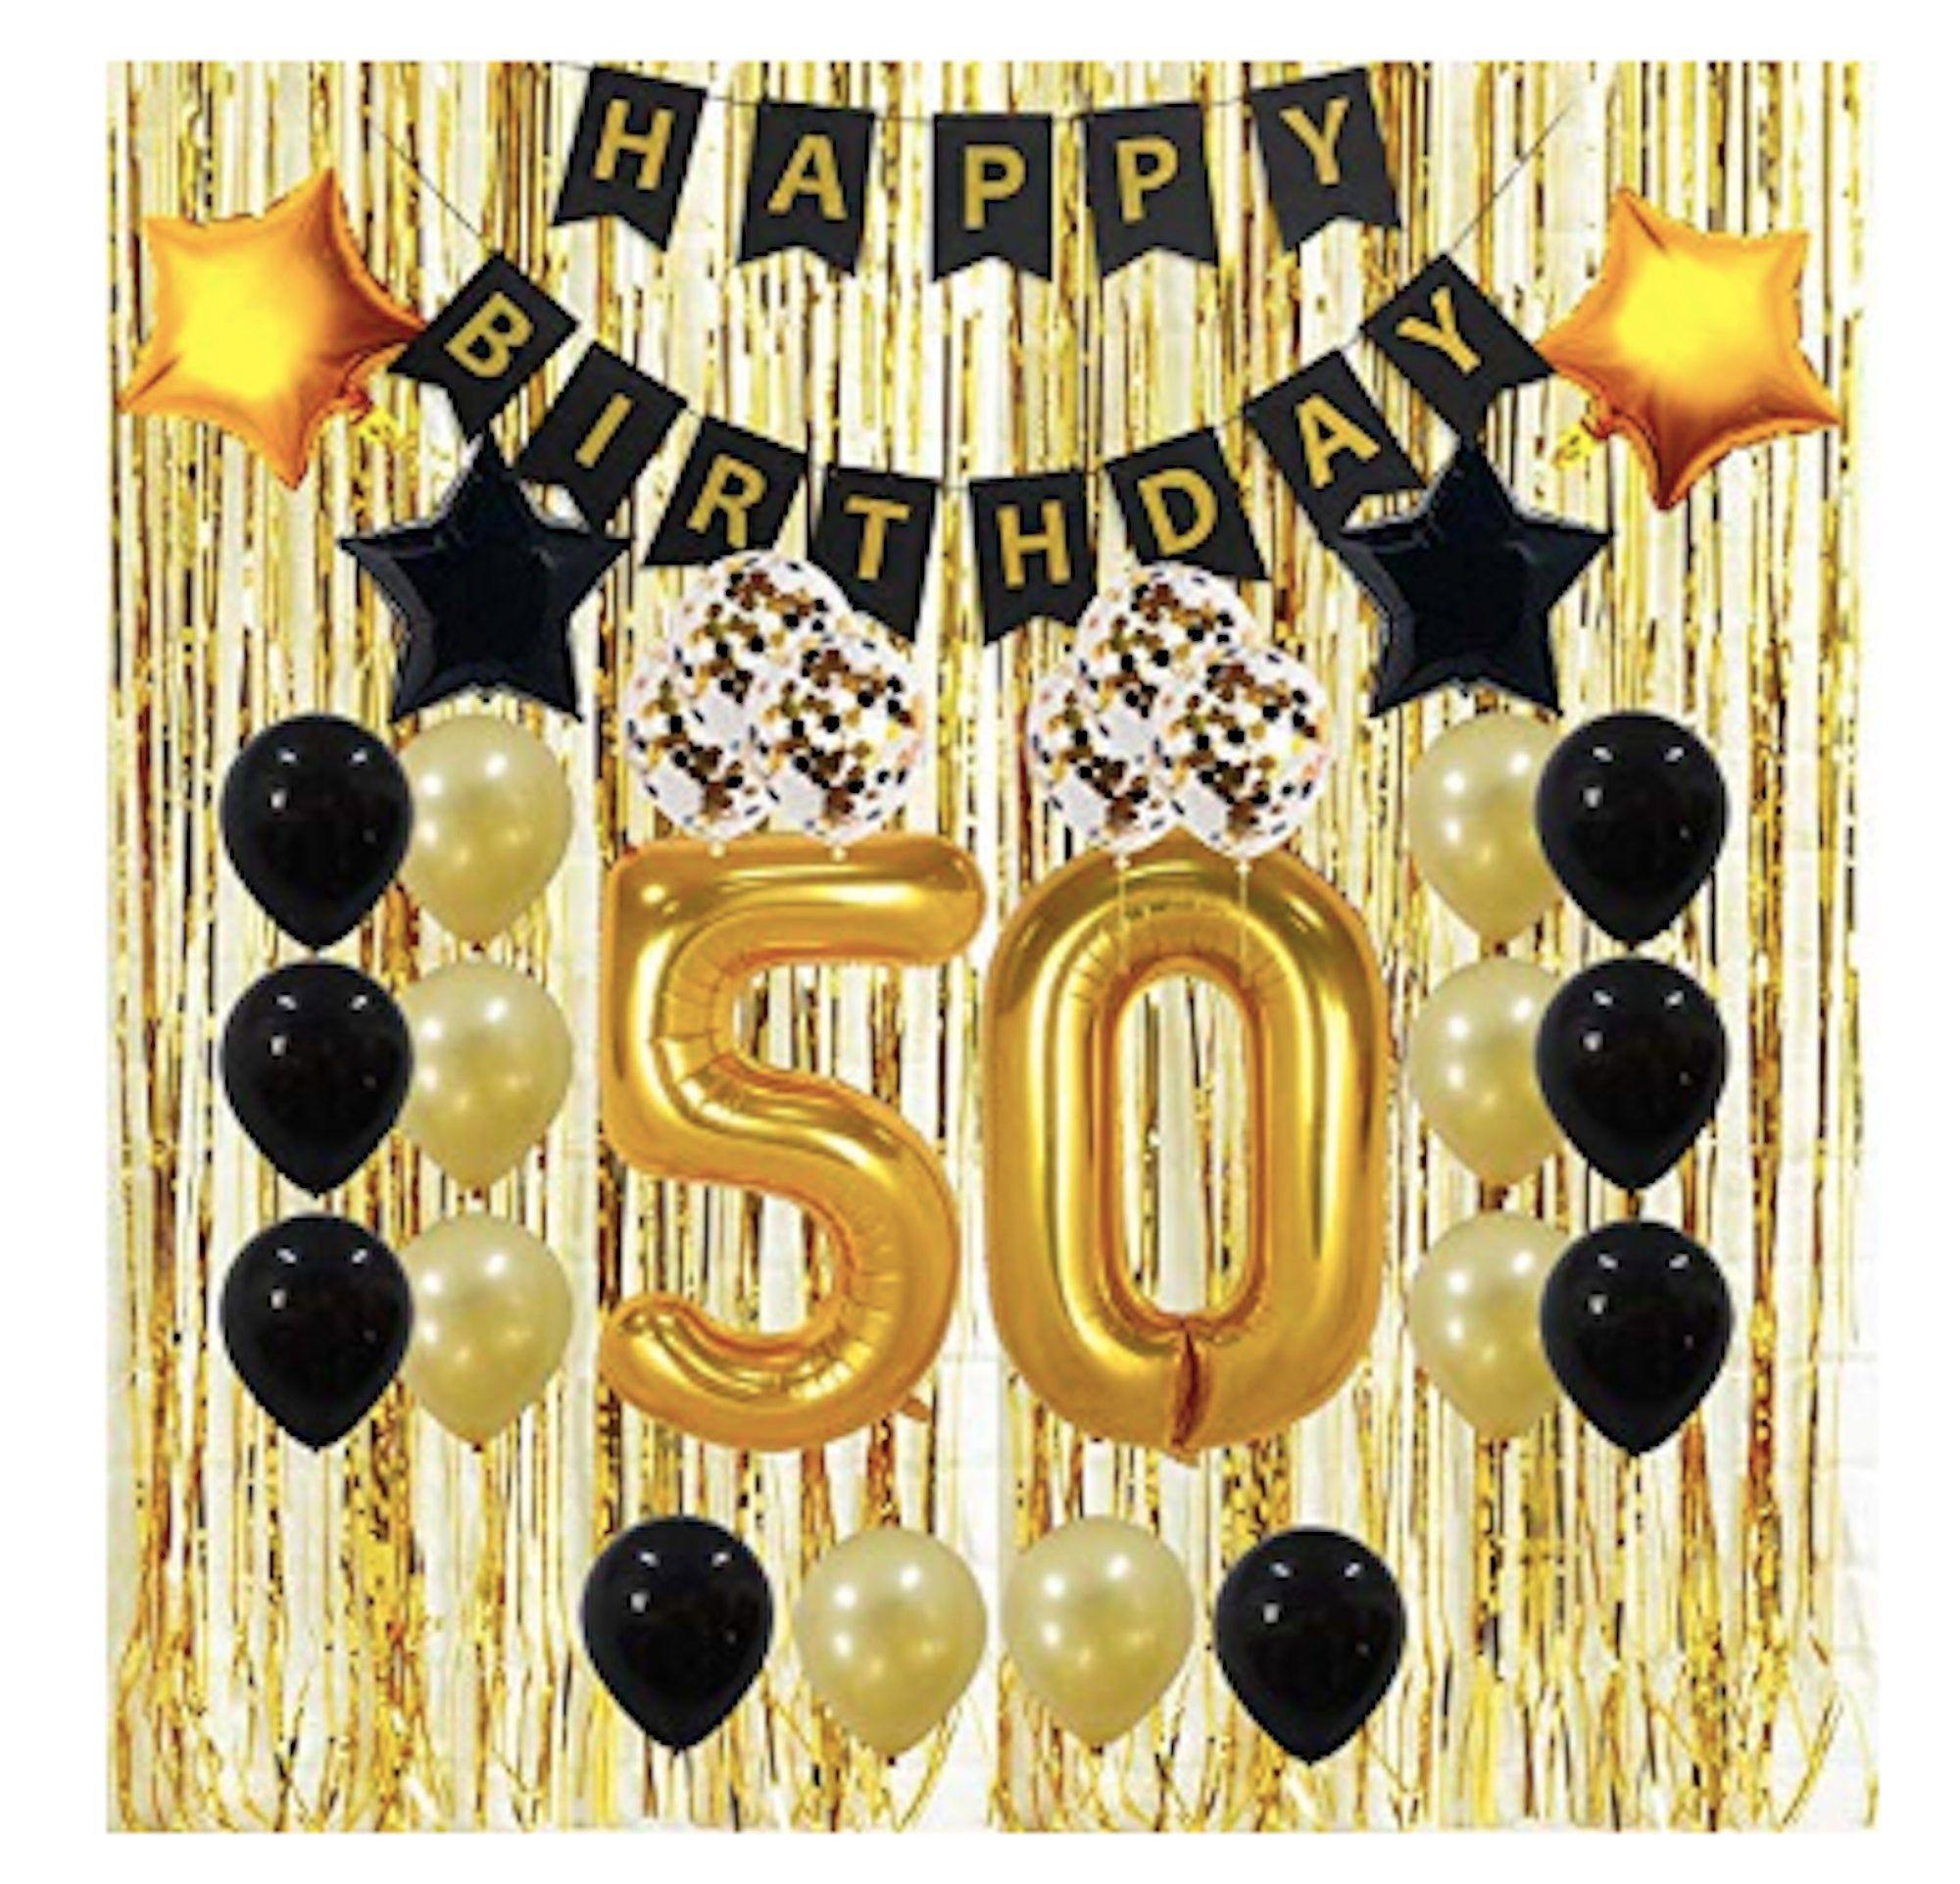 10 Lulu Birthday Ideas Birthday 50th Birthday Party Decorations 50th Birthday Decorations